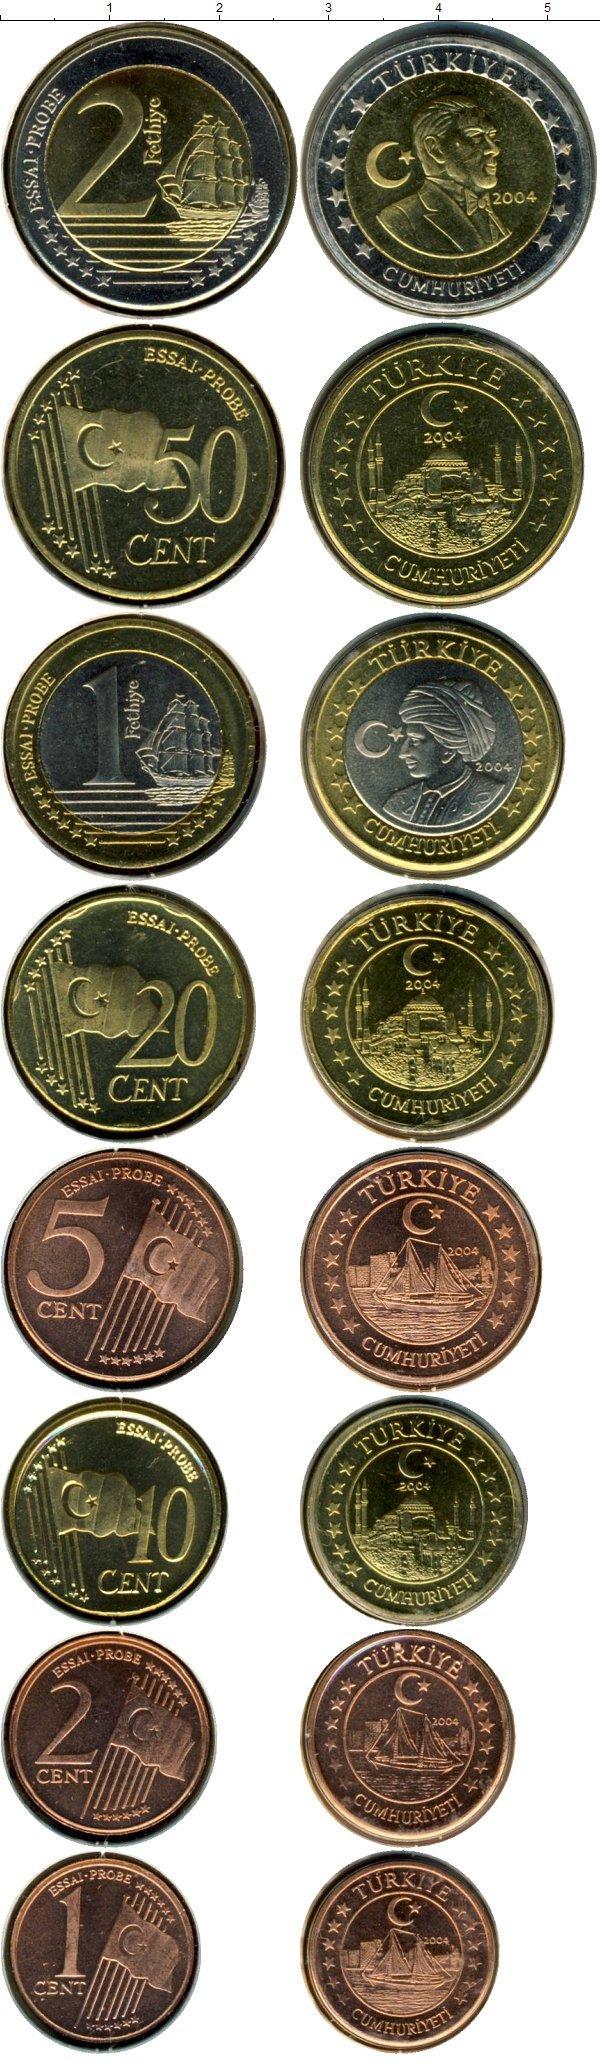 Каталог монет - Турция Евро-модель